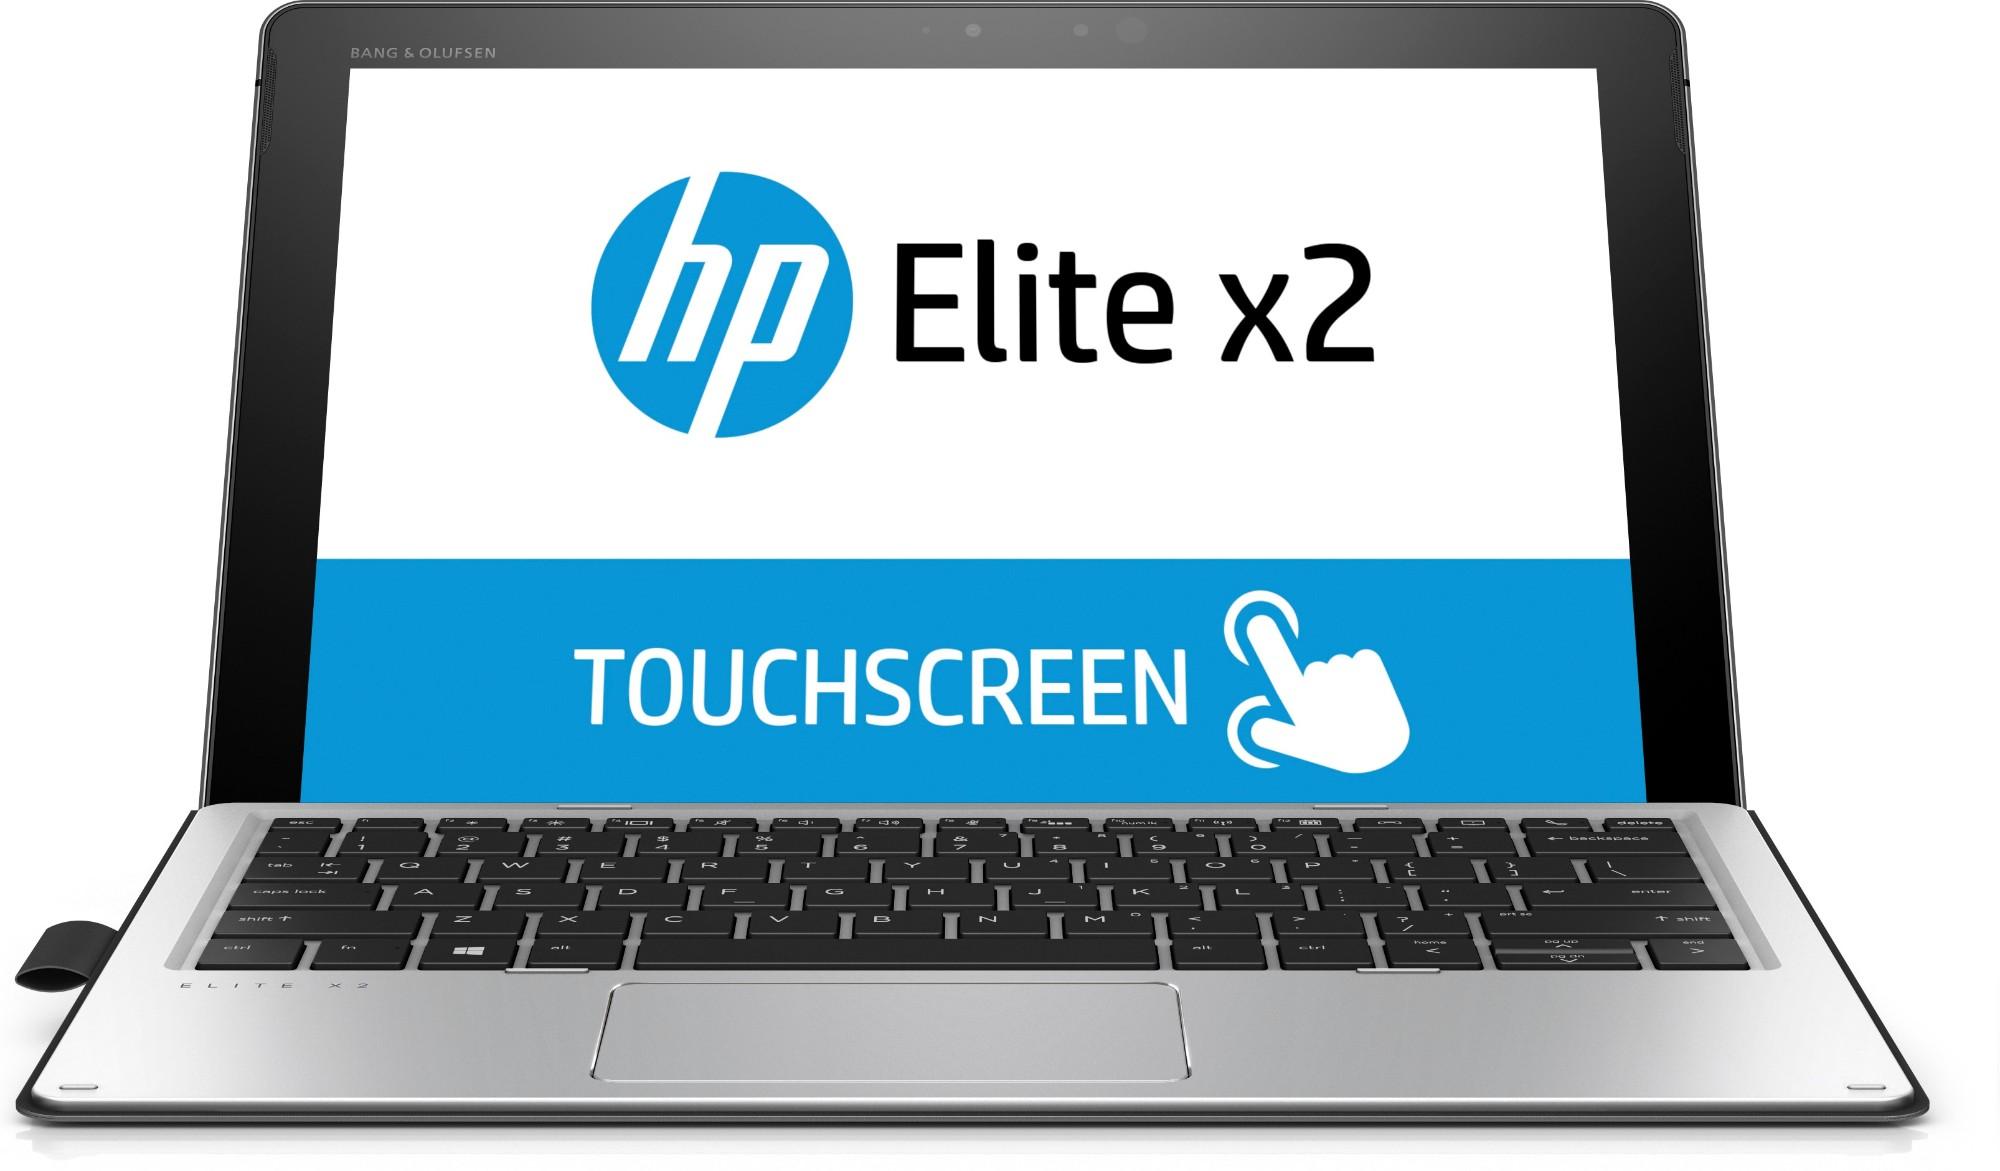 "HP Elite x2 1012 G2 Silver Hybrid (2-in-1) 31.2 cm (12.3"") 2736 x 1824 pixels Touchscreen 7th gen Intel® Core™ i5 i5-7200U 8 GB LPDDR3-SDRAM 256 GB SSD"